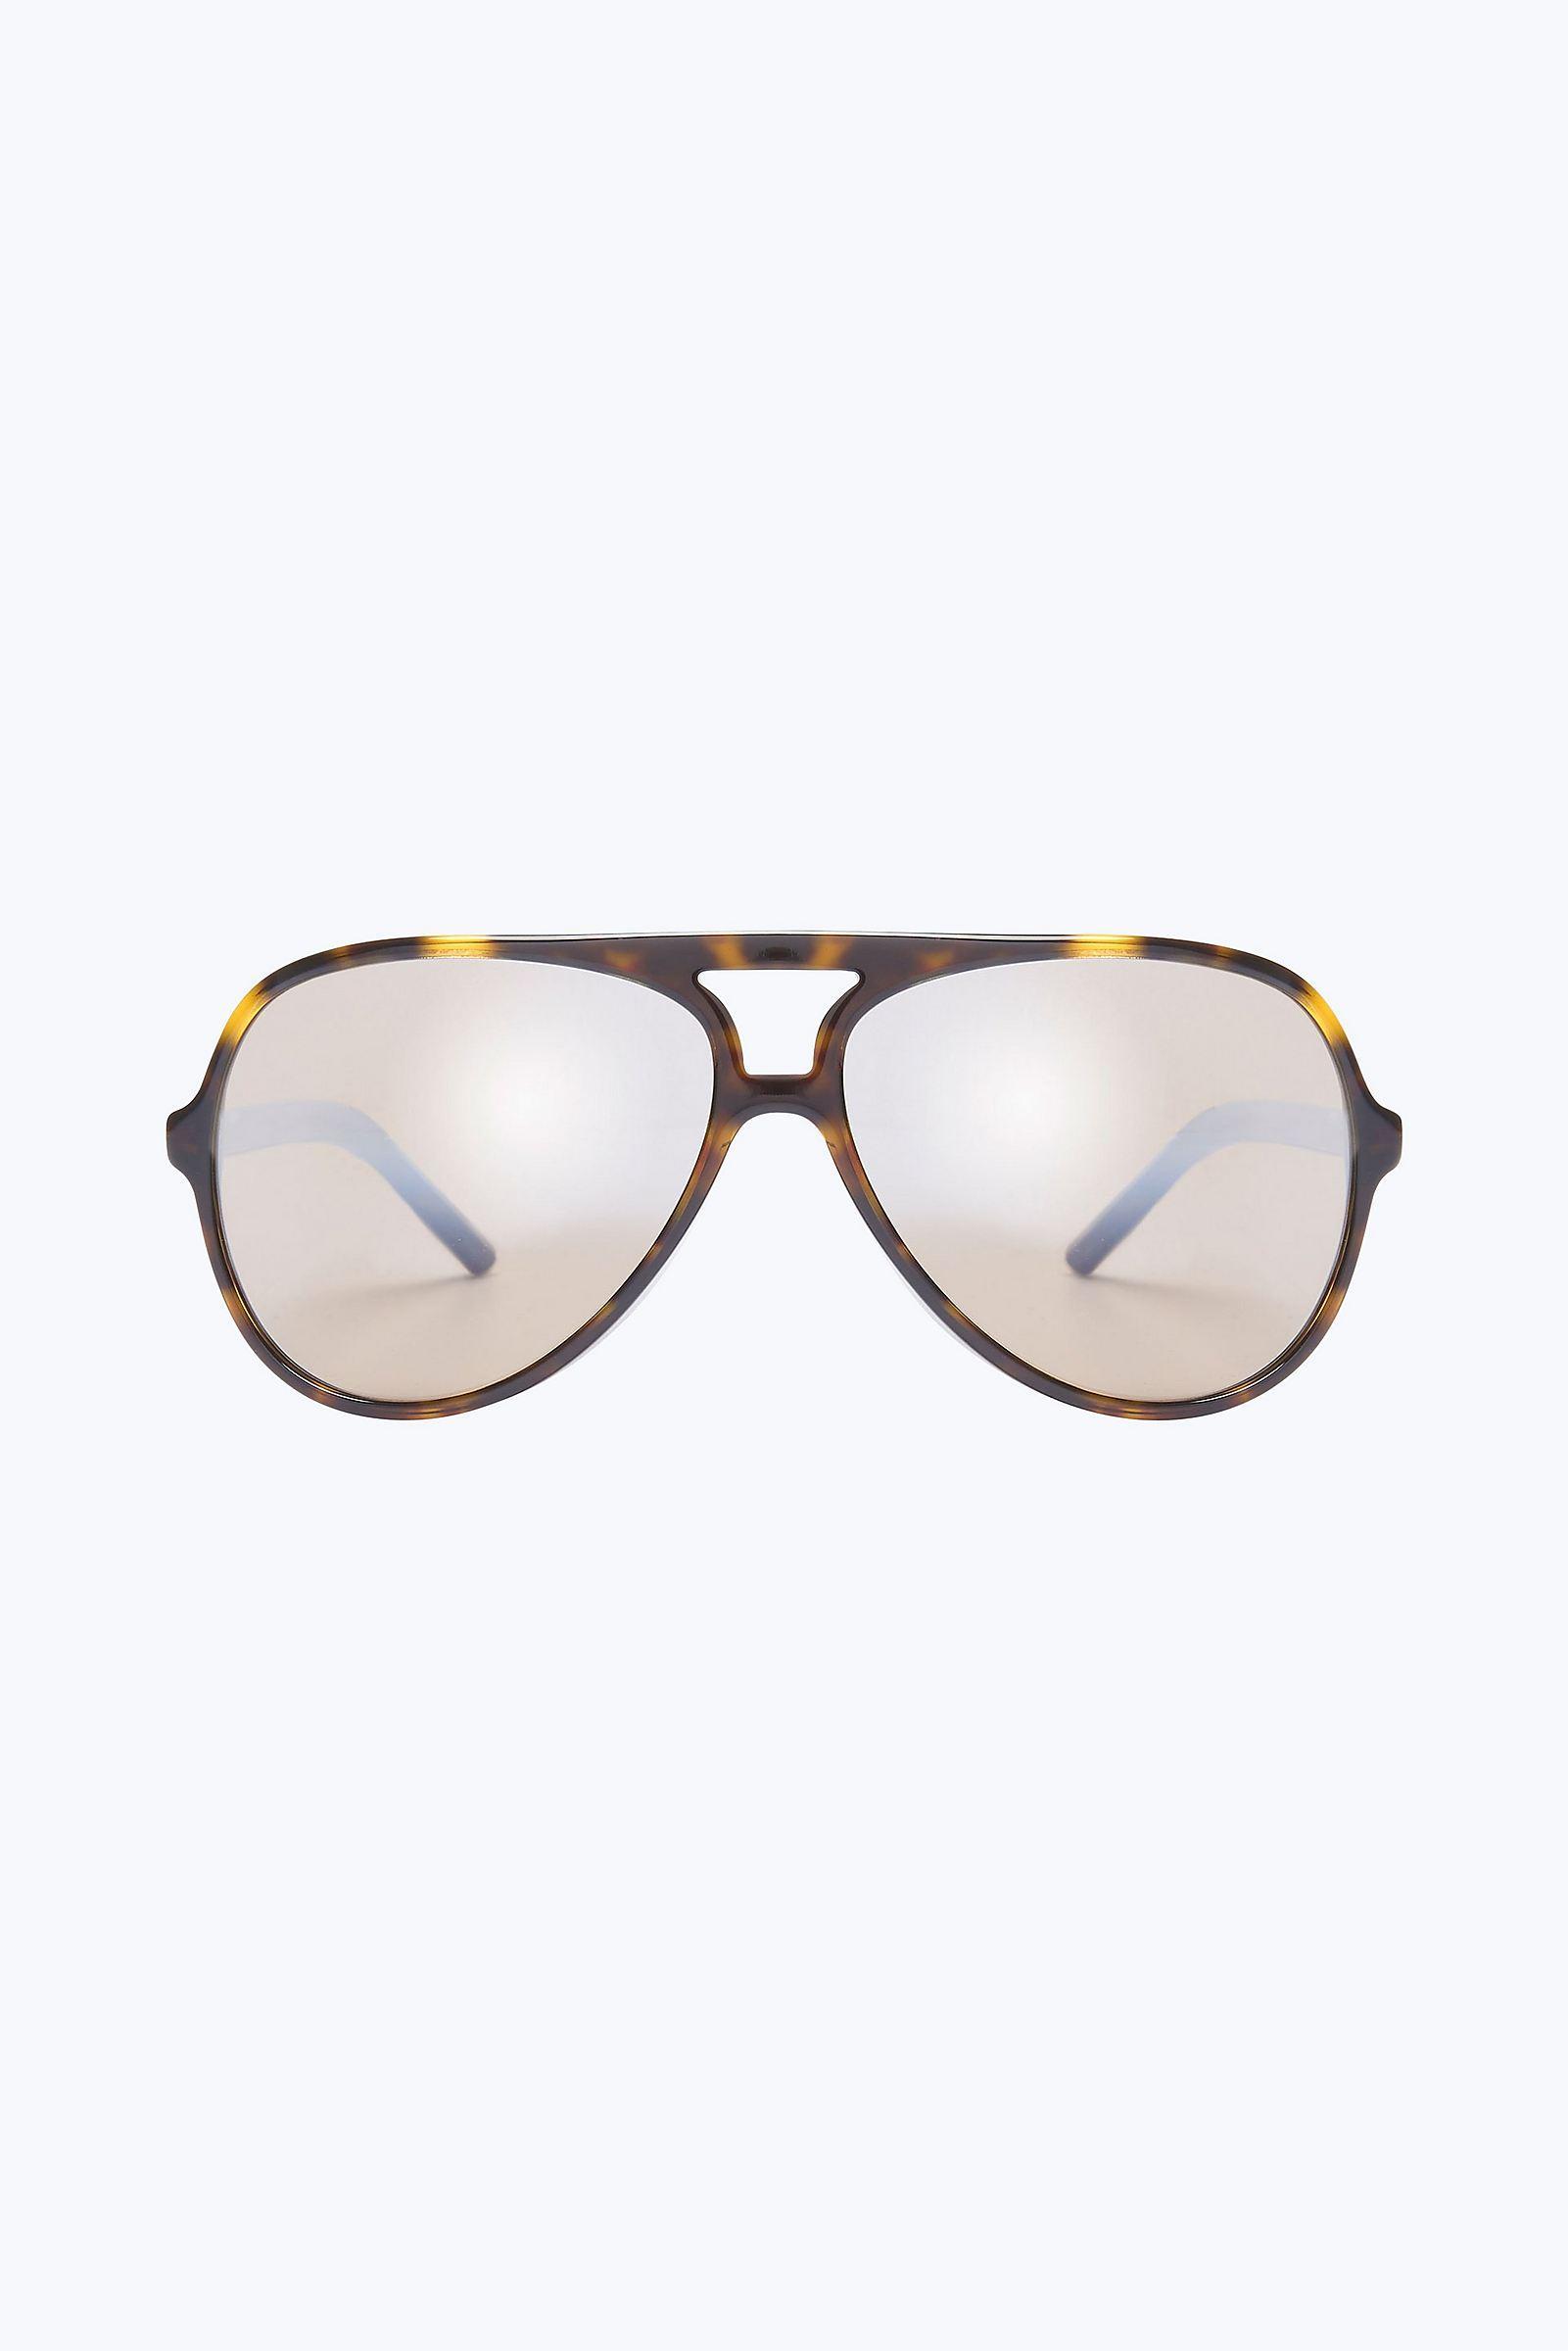 0b8b4330dc85c ... Multicolor Navigator Sunglasses - Lyst. View fullscreen